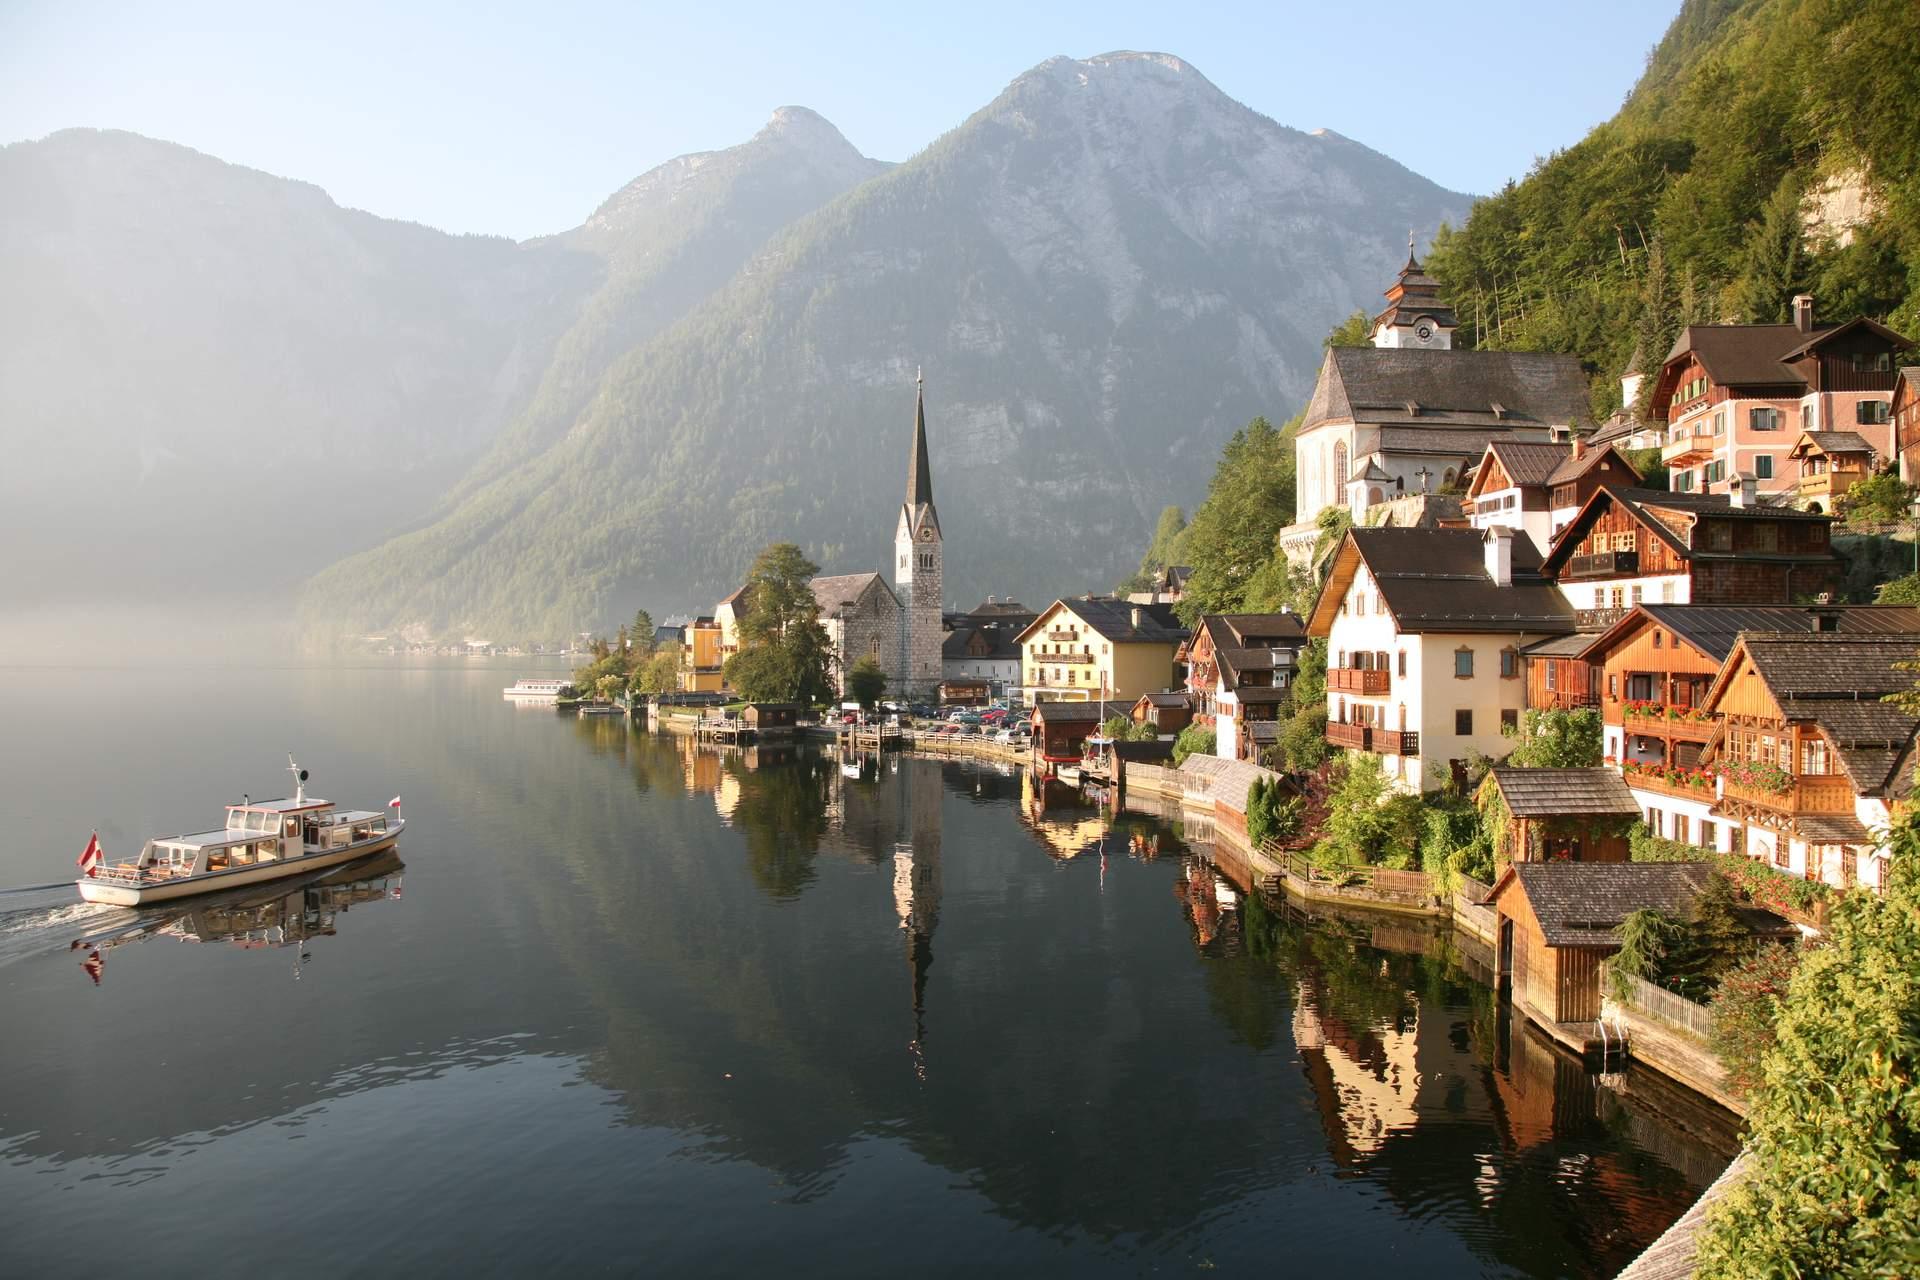 Salzburg: Hallstatt